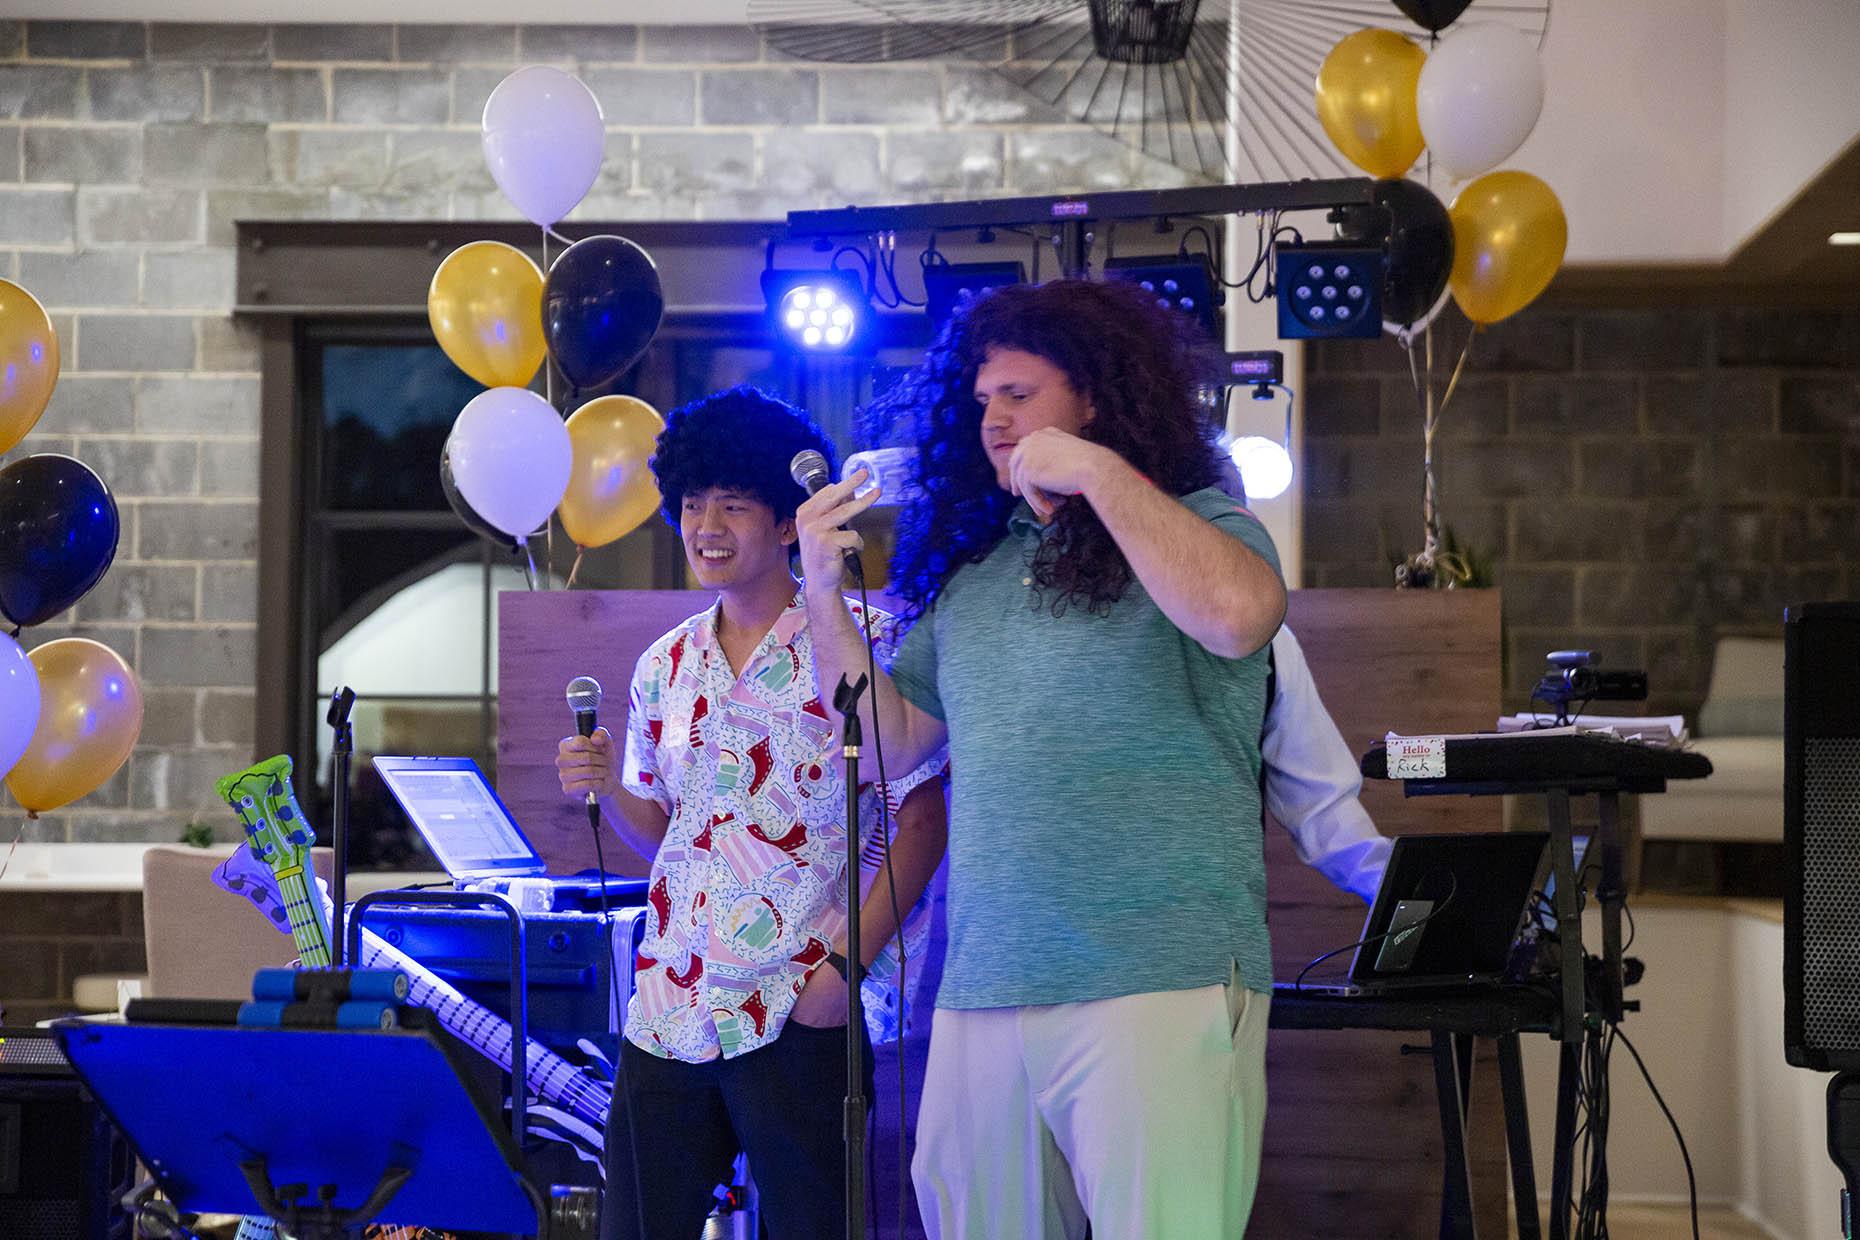 JRA_KaraokeEvent_03.06.19__3170-e_webuse.jpg